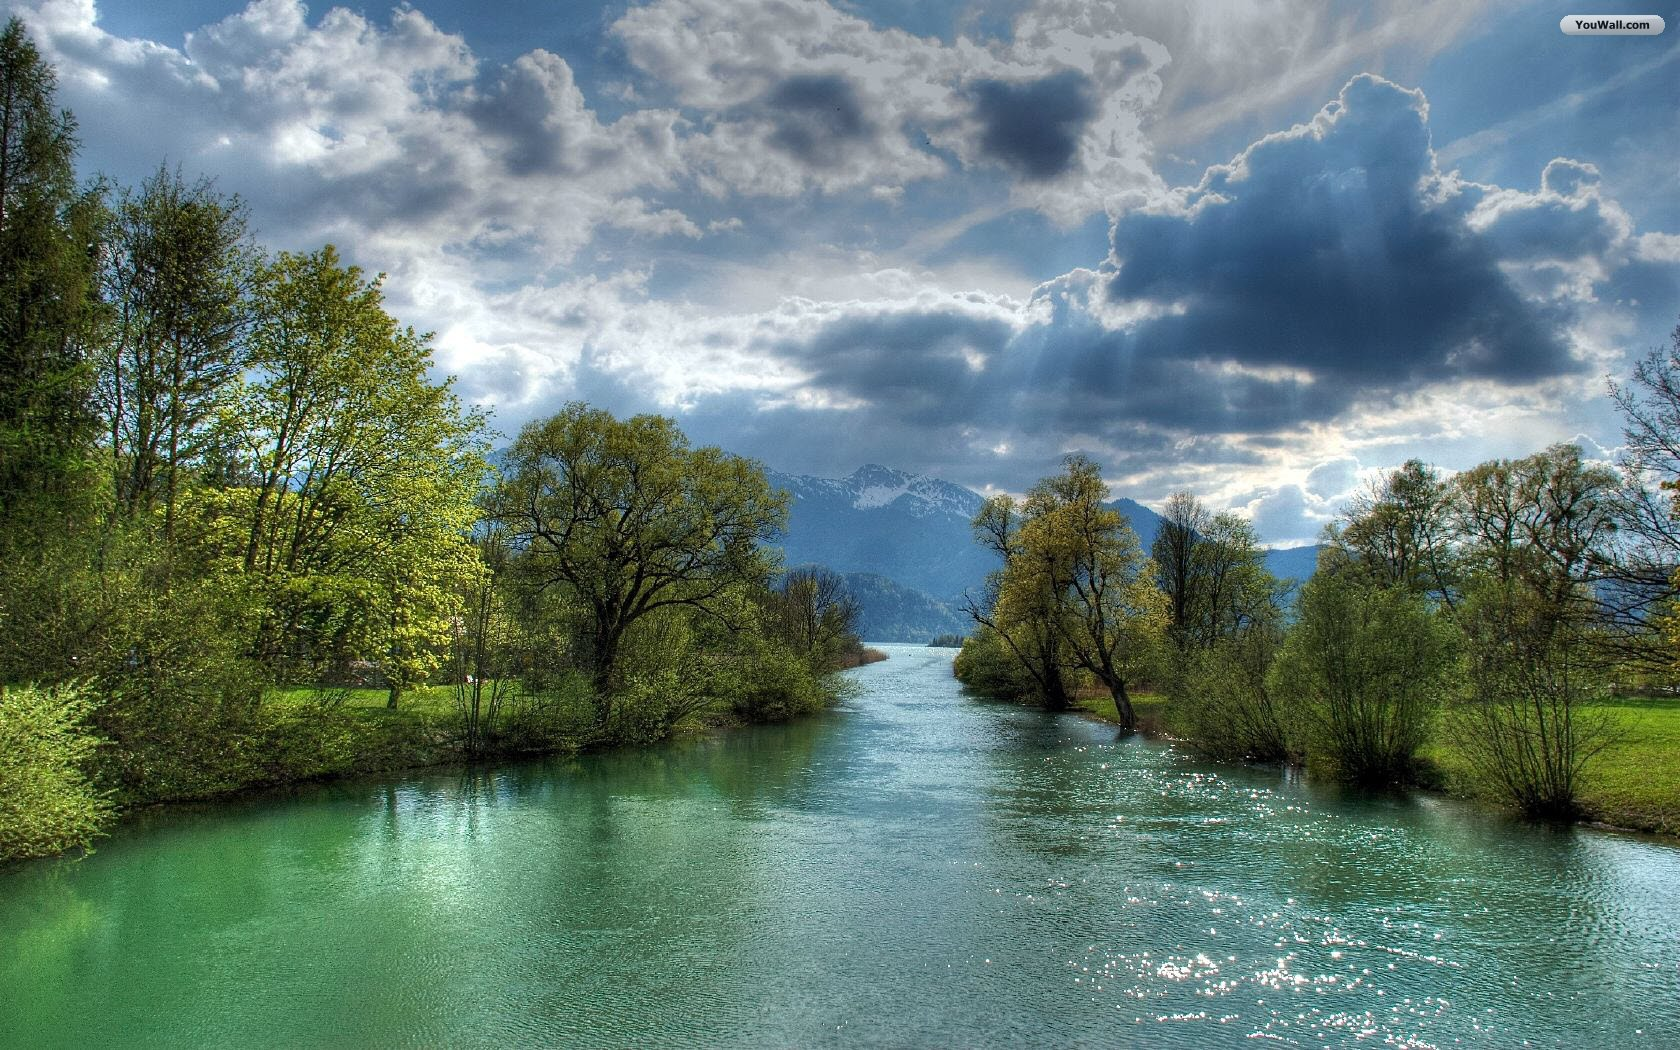 River Wallpaper   wallpaperwallpapersfree wallpaperphotodesktop 1680x1050